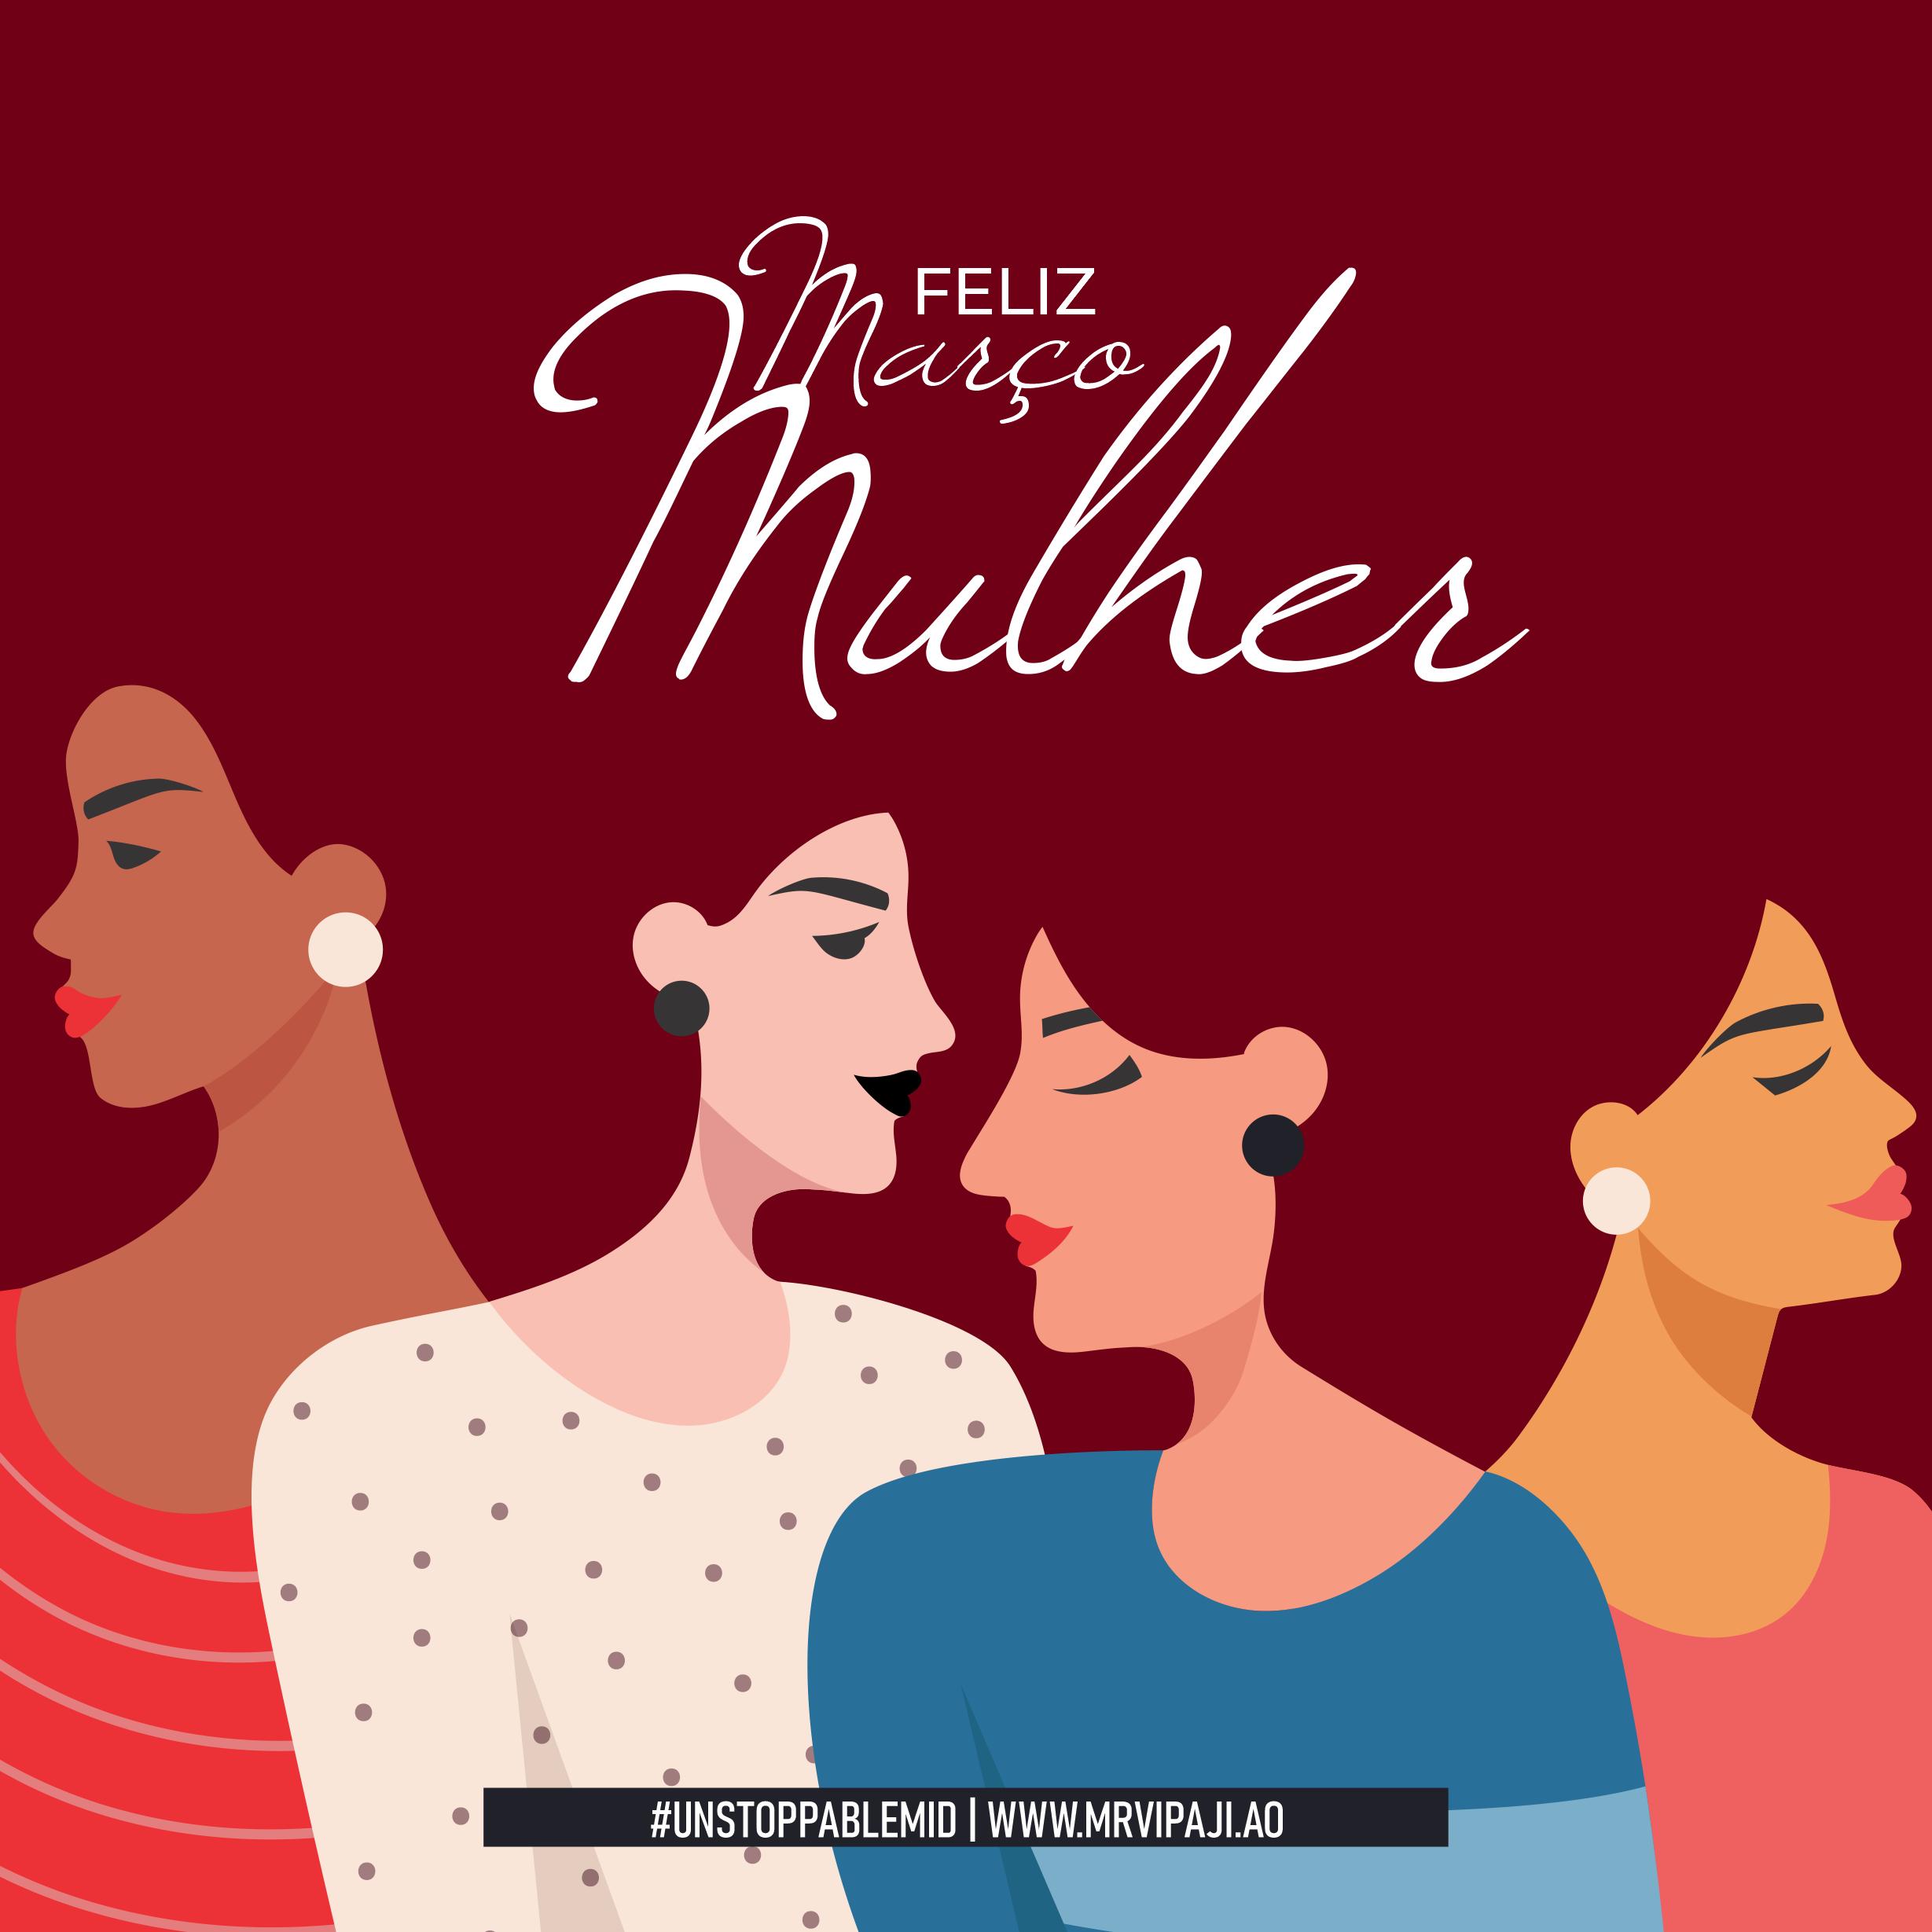 FELIZ MARÇO MULHER